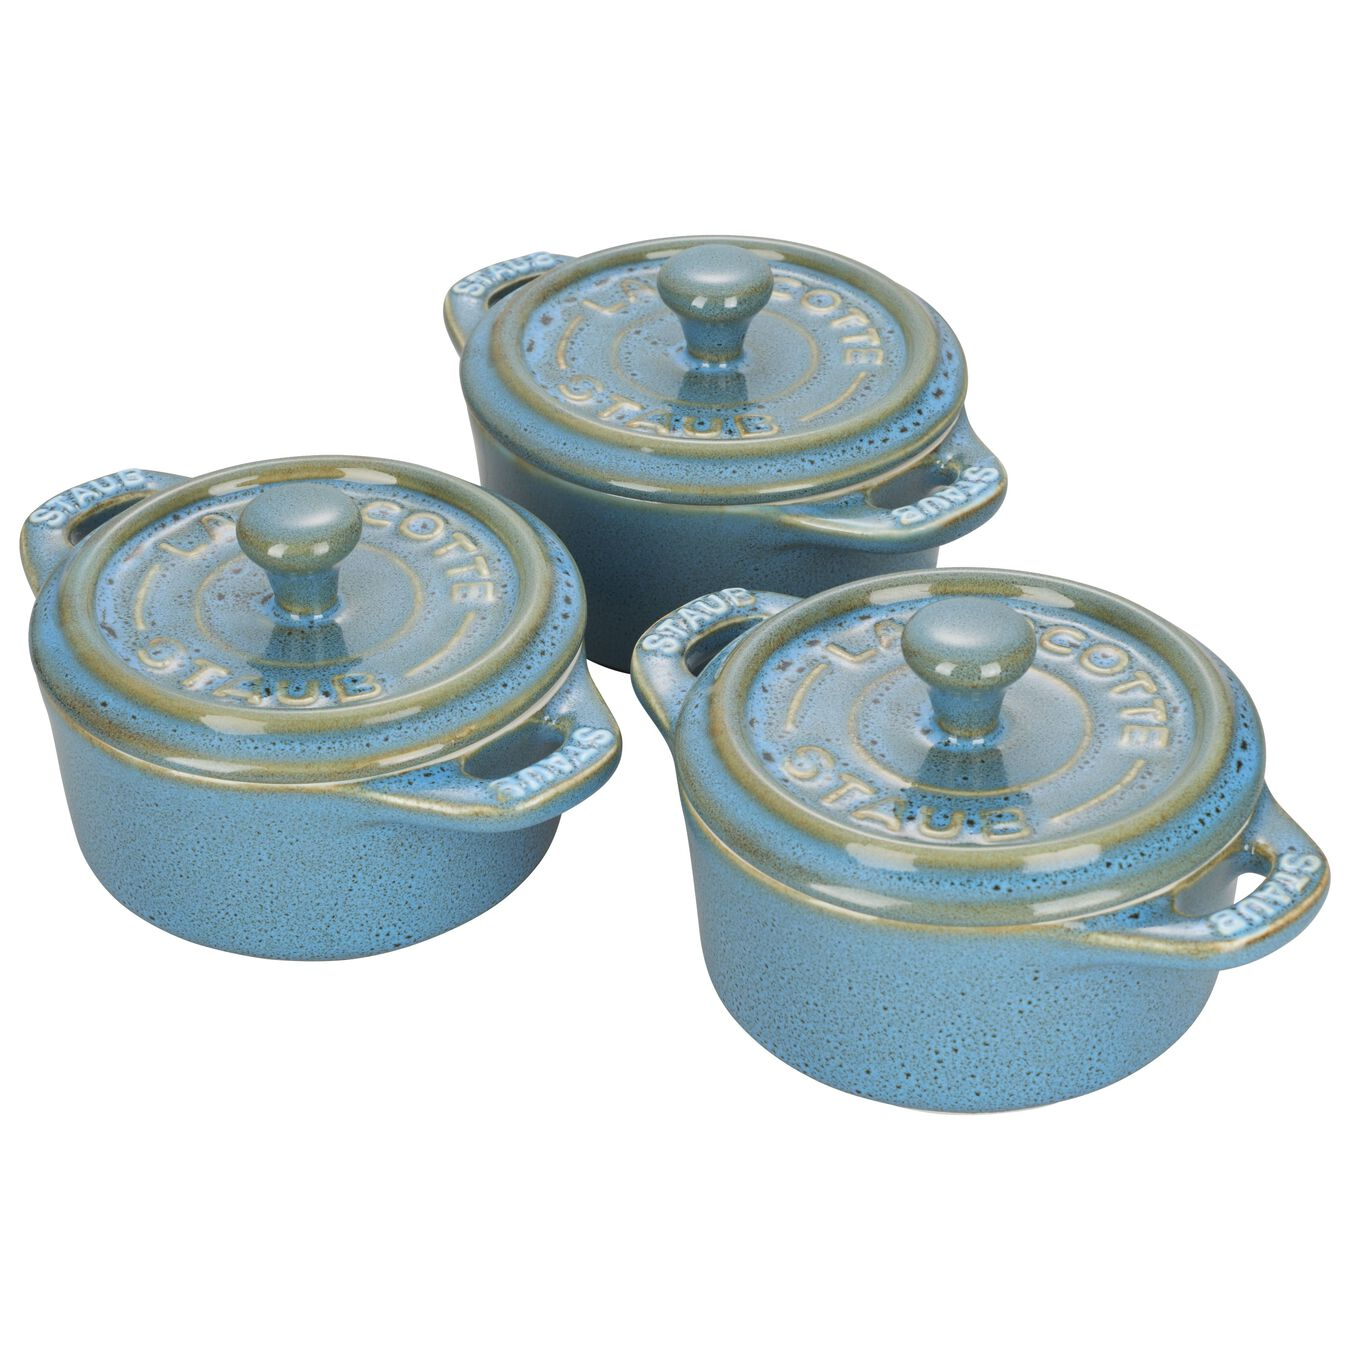 3-pc Mini Round Cocotte Set - Rustic Turquoise,,large 1